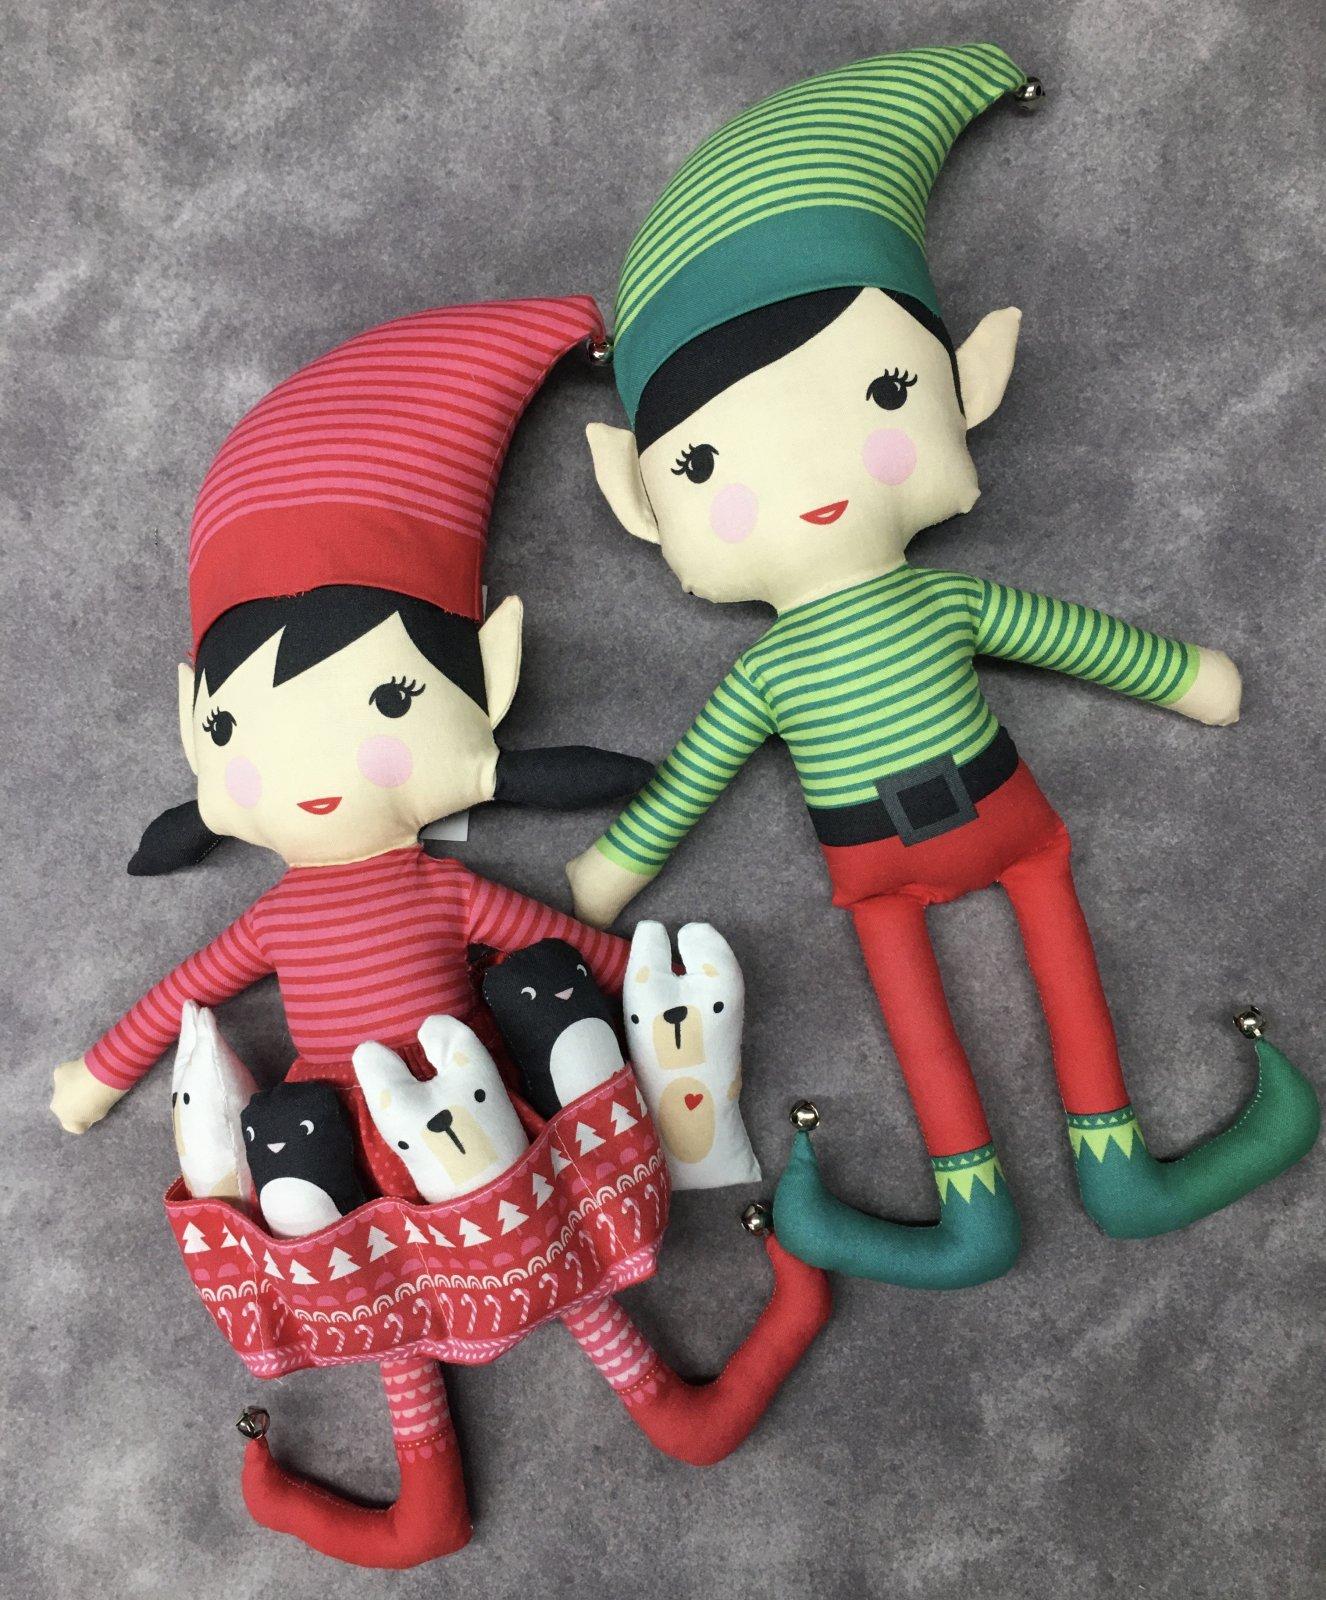 MODEL- North Pole Dolls